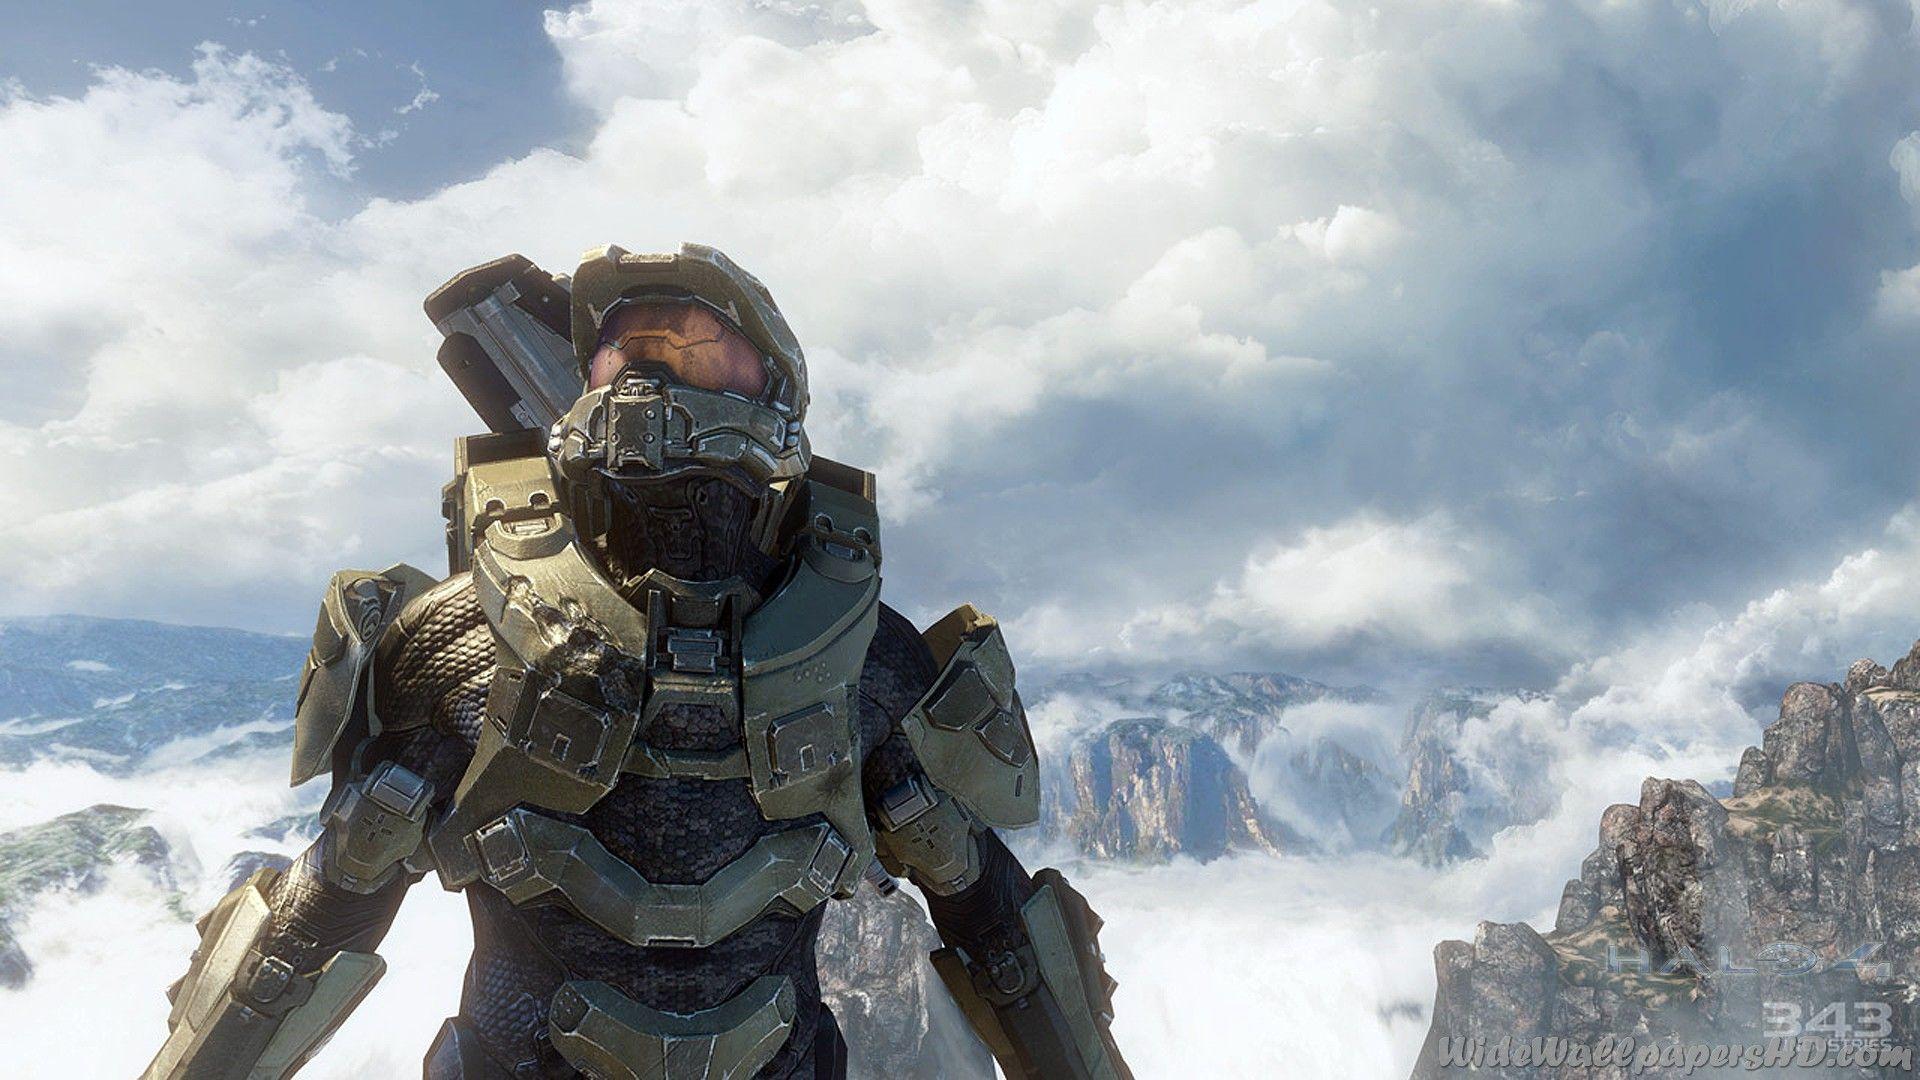 Master chief wallpapers hd wallpapersafari - Halo 5 screensaver ...